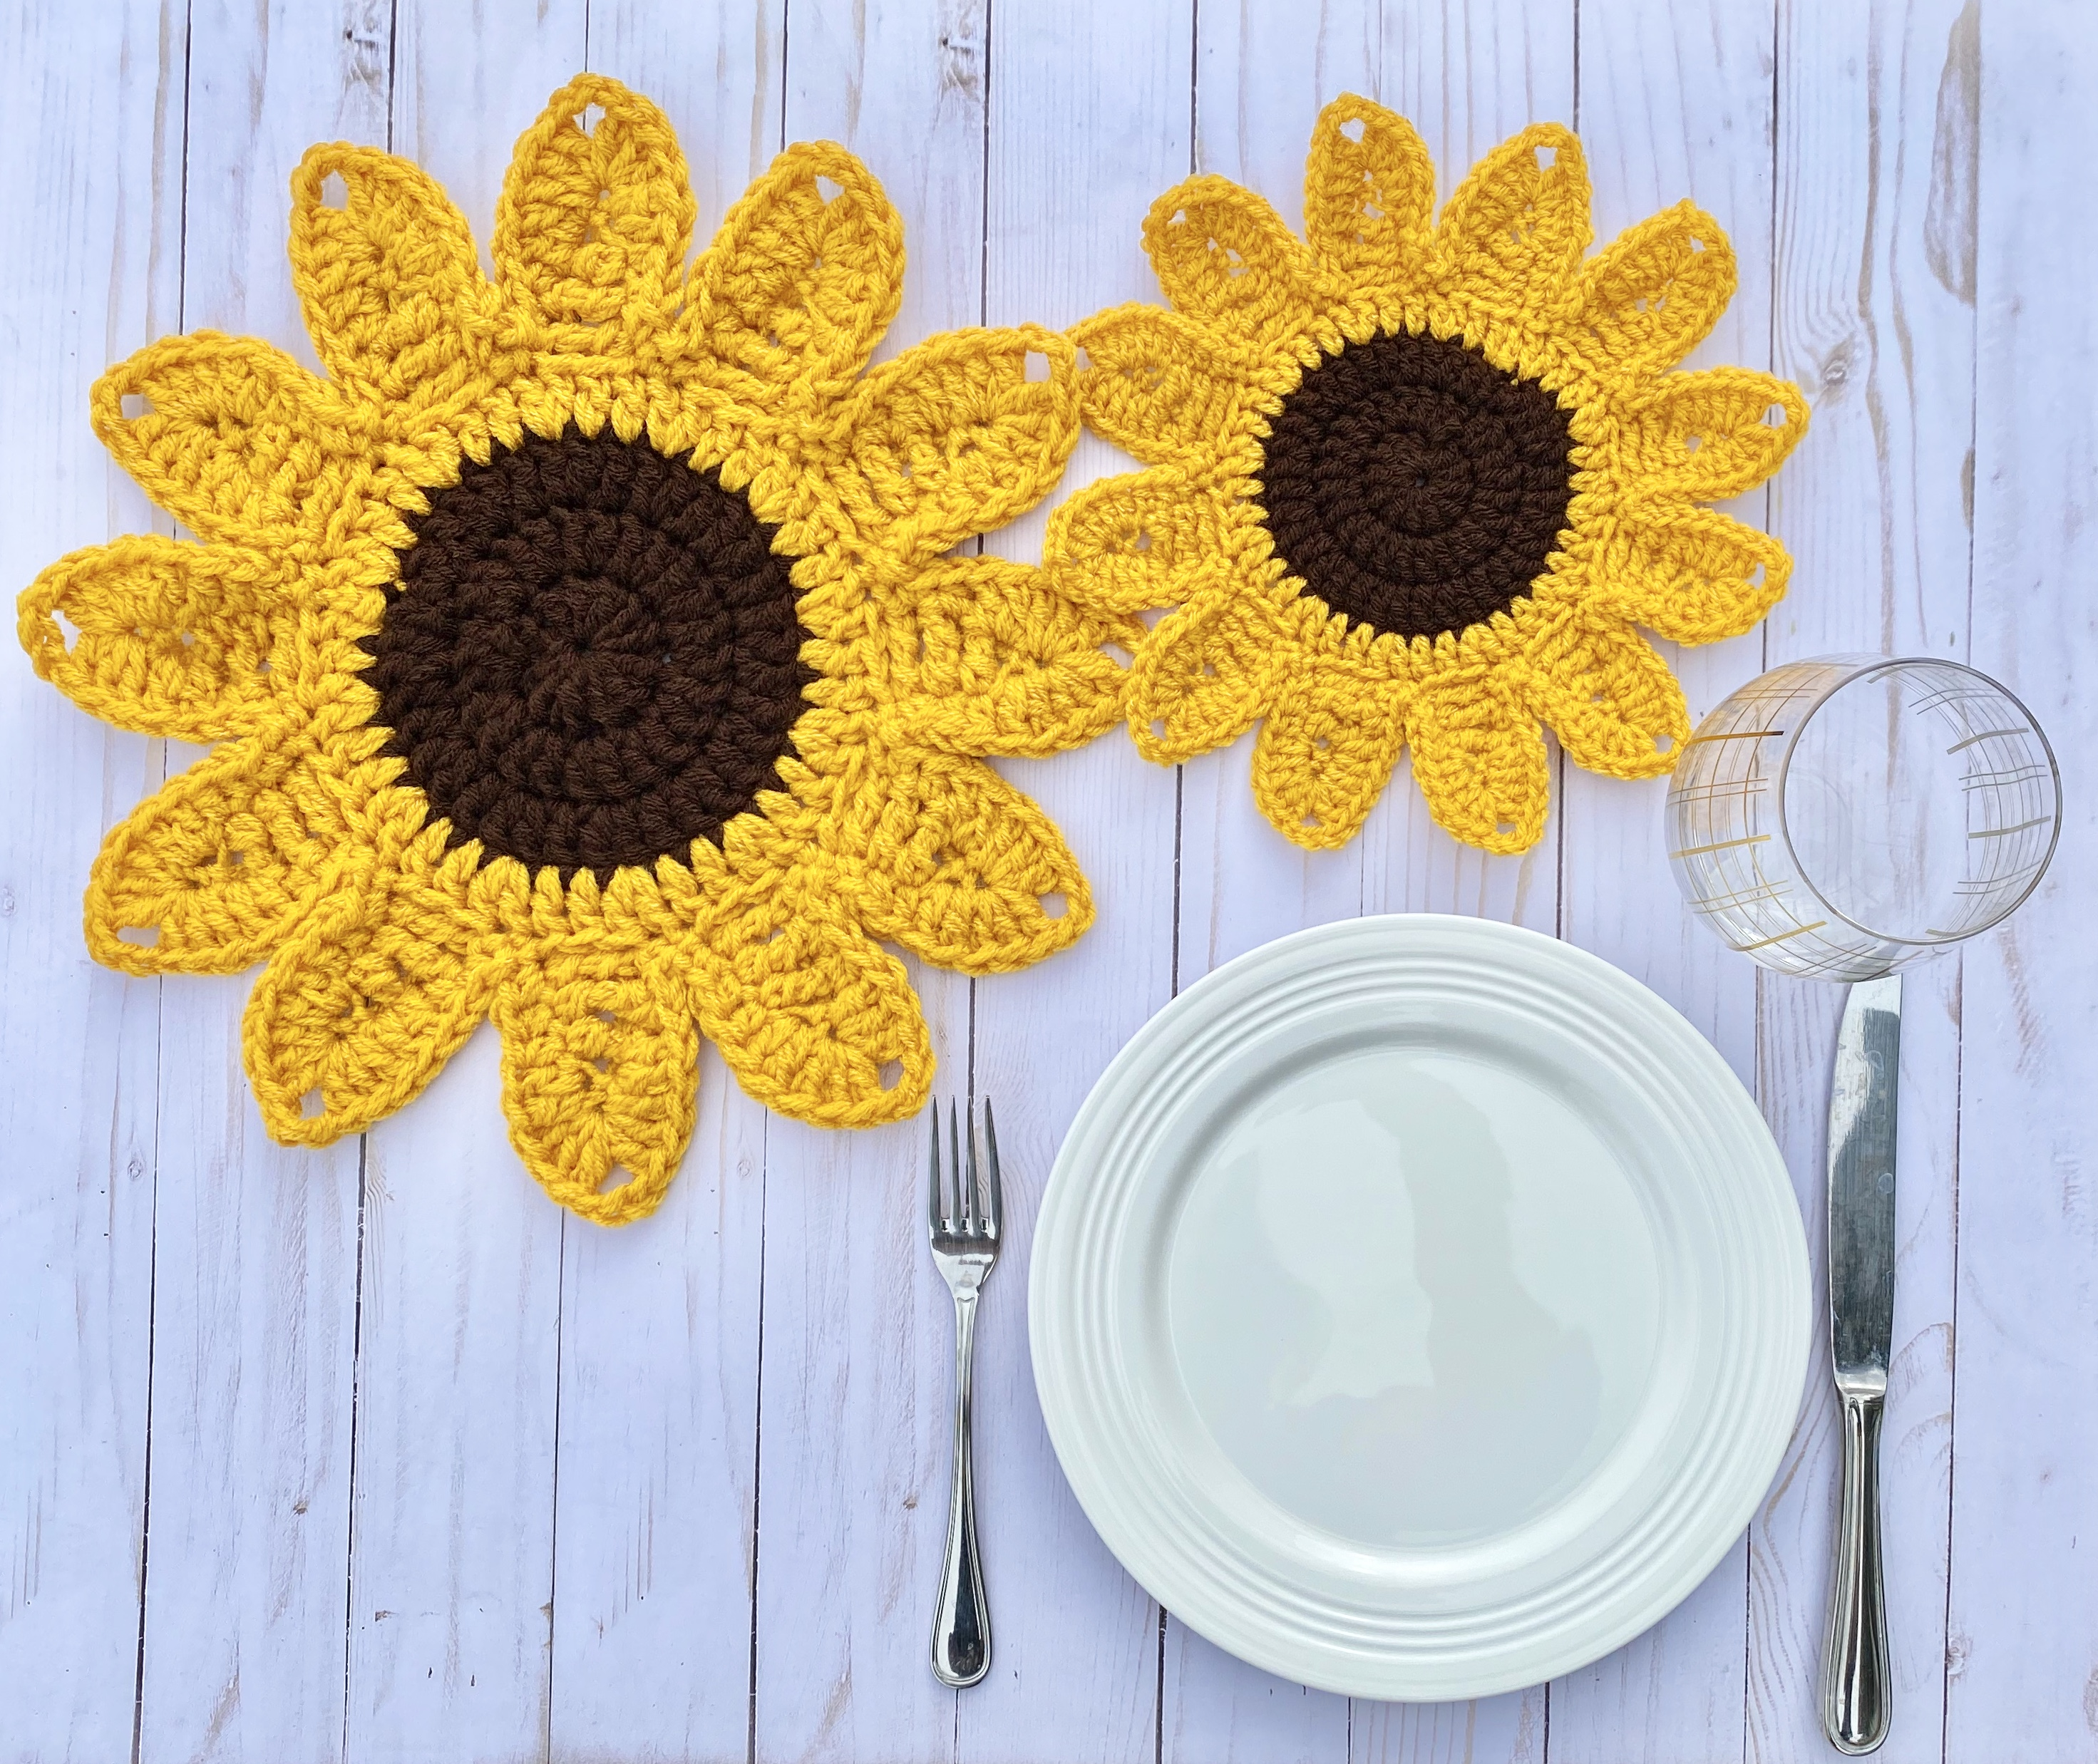 Amigurumi Sunflower Crochet Free Patterns • DIY How To | 2475x2943